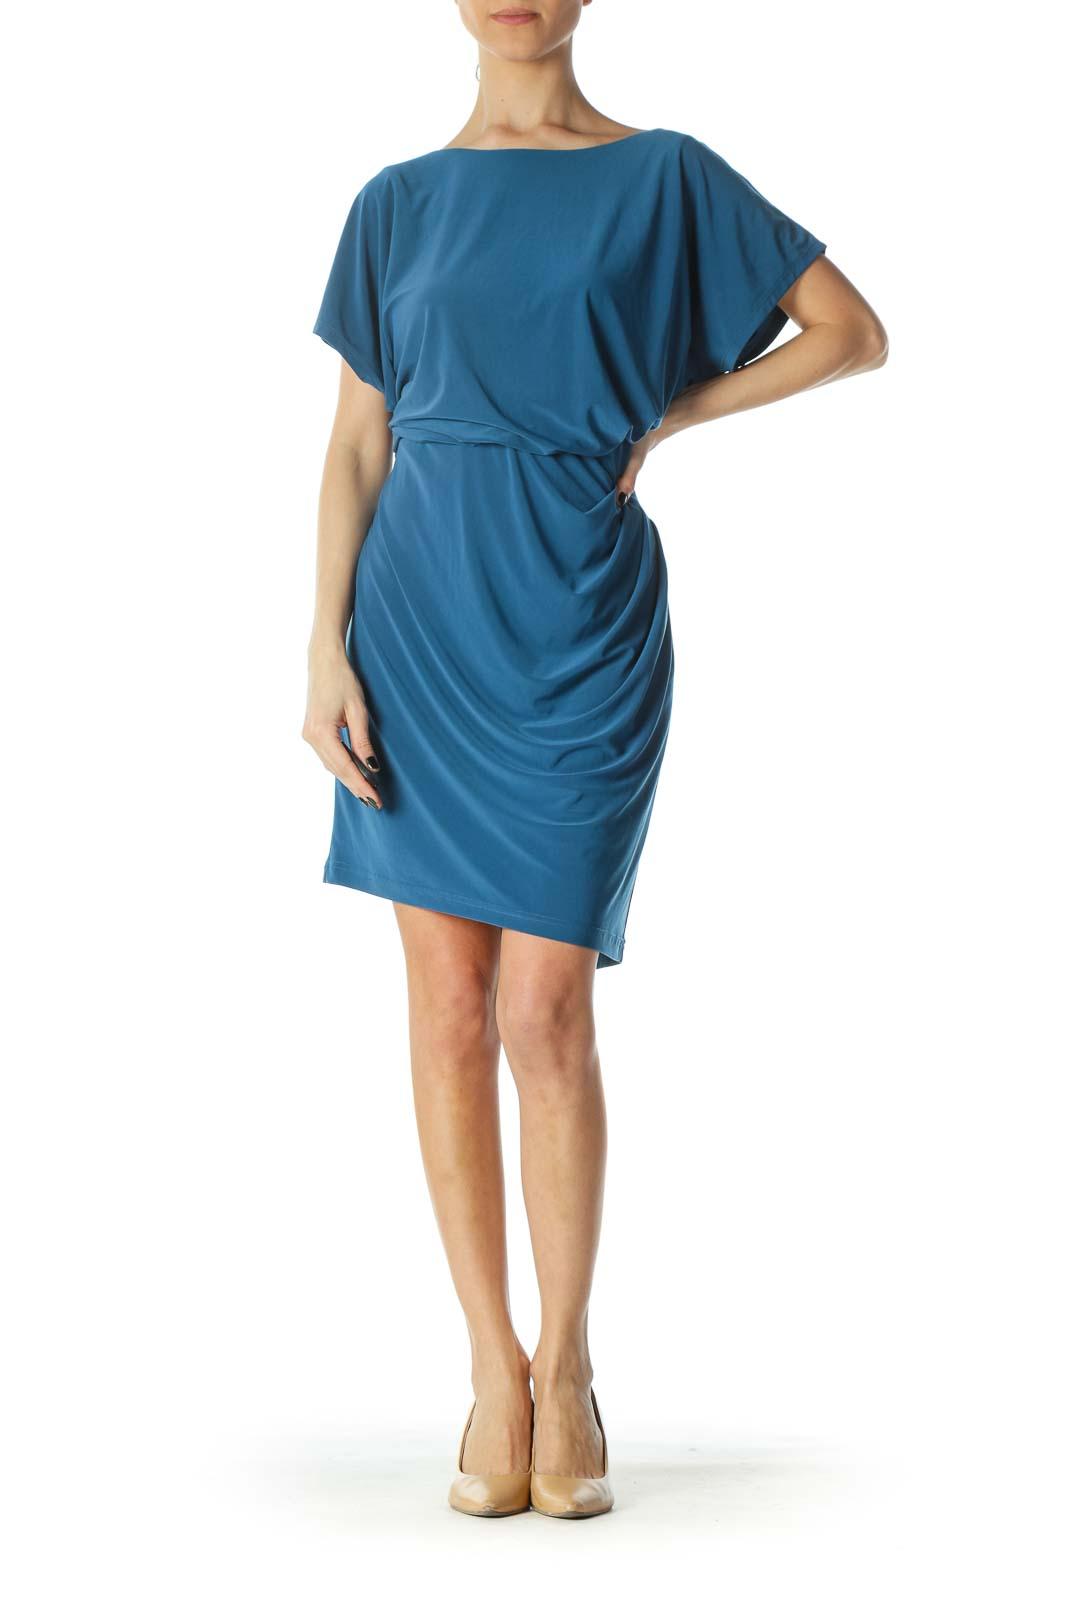 Teal Blue Short Sleeve Stretch Work Dress